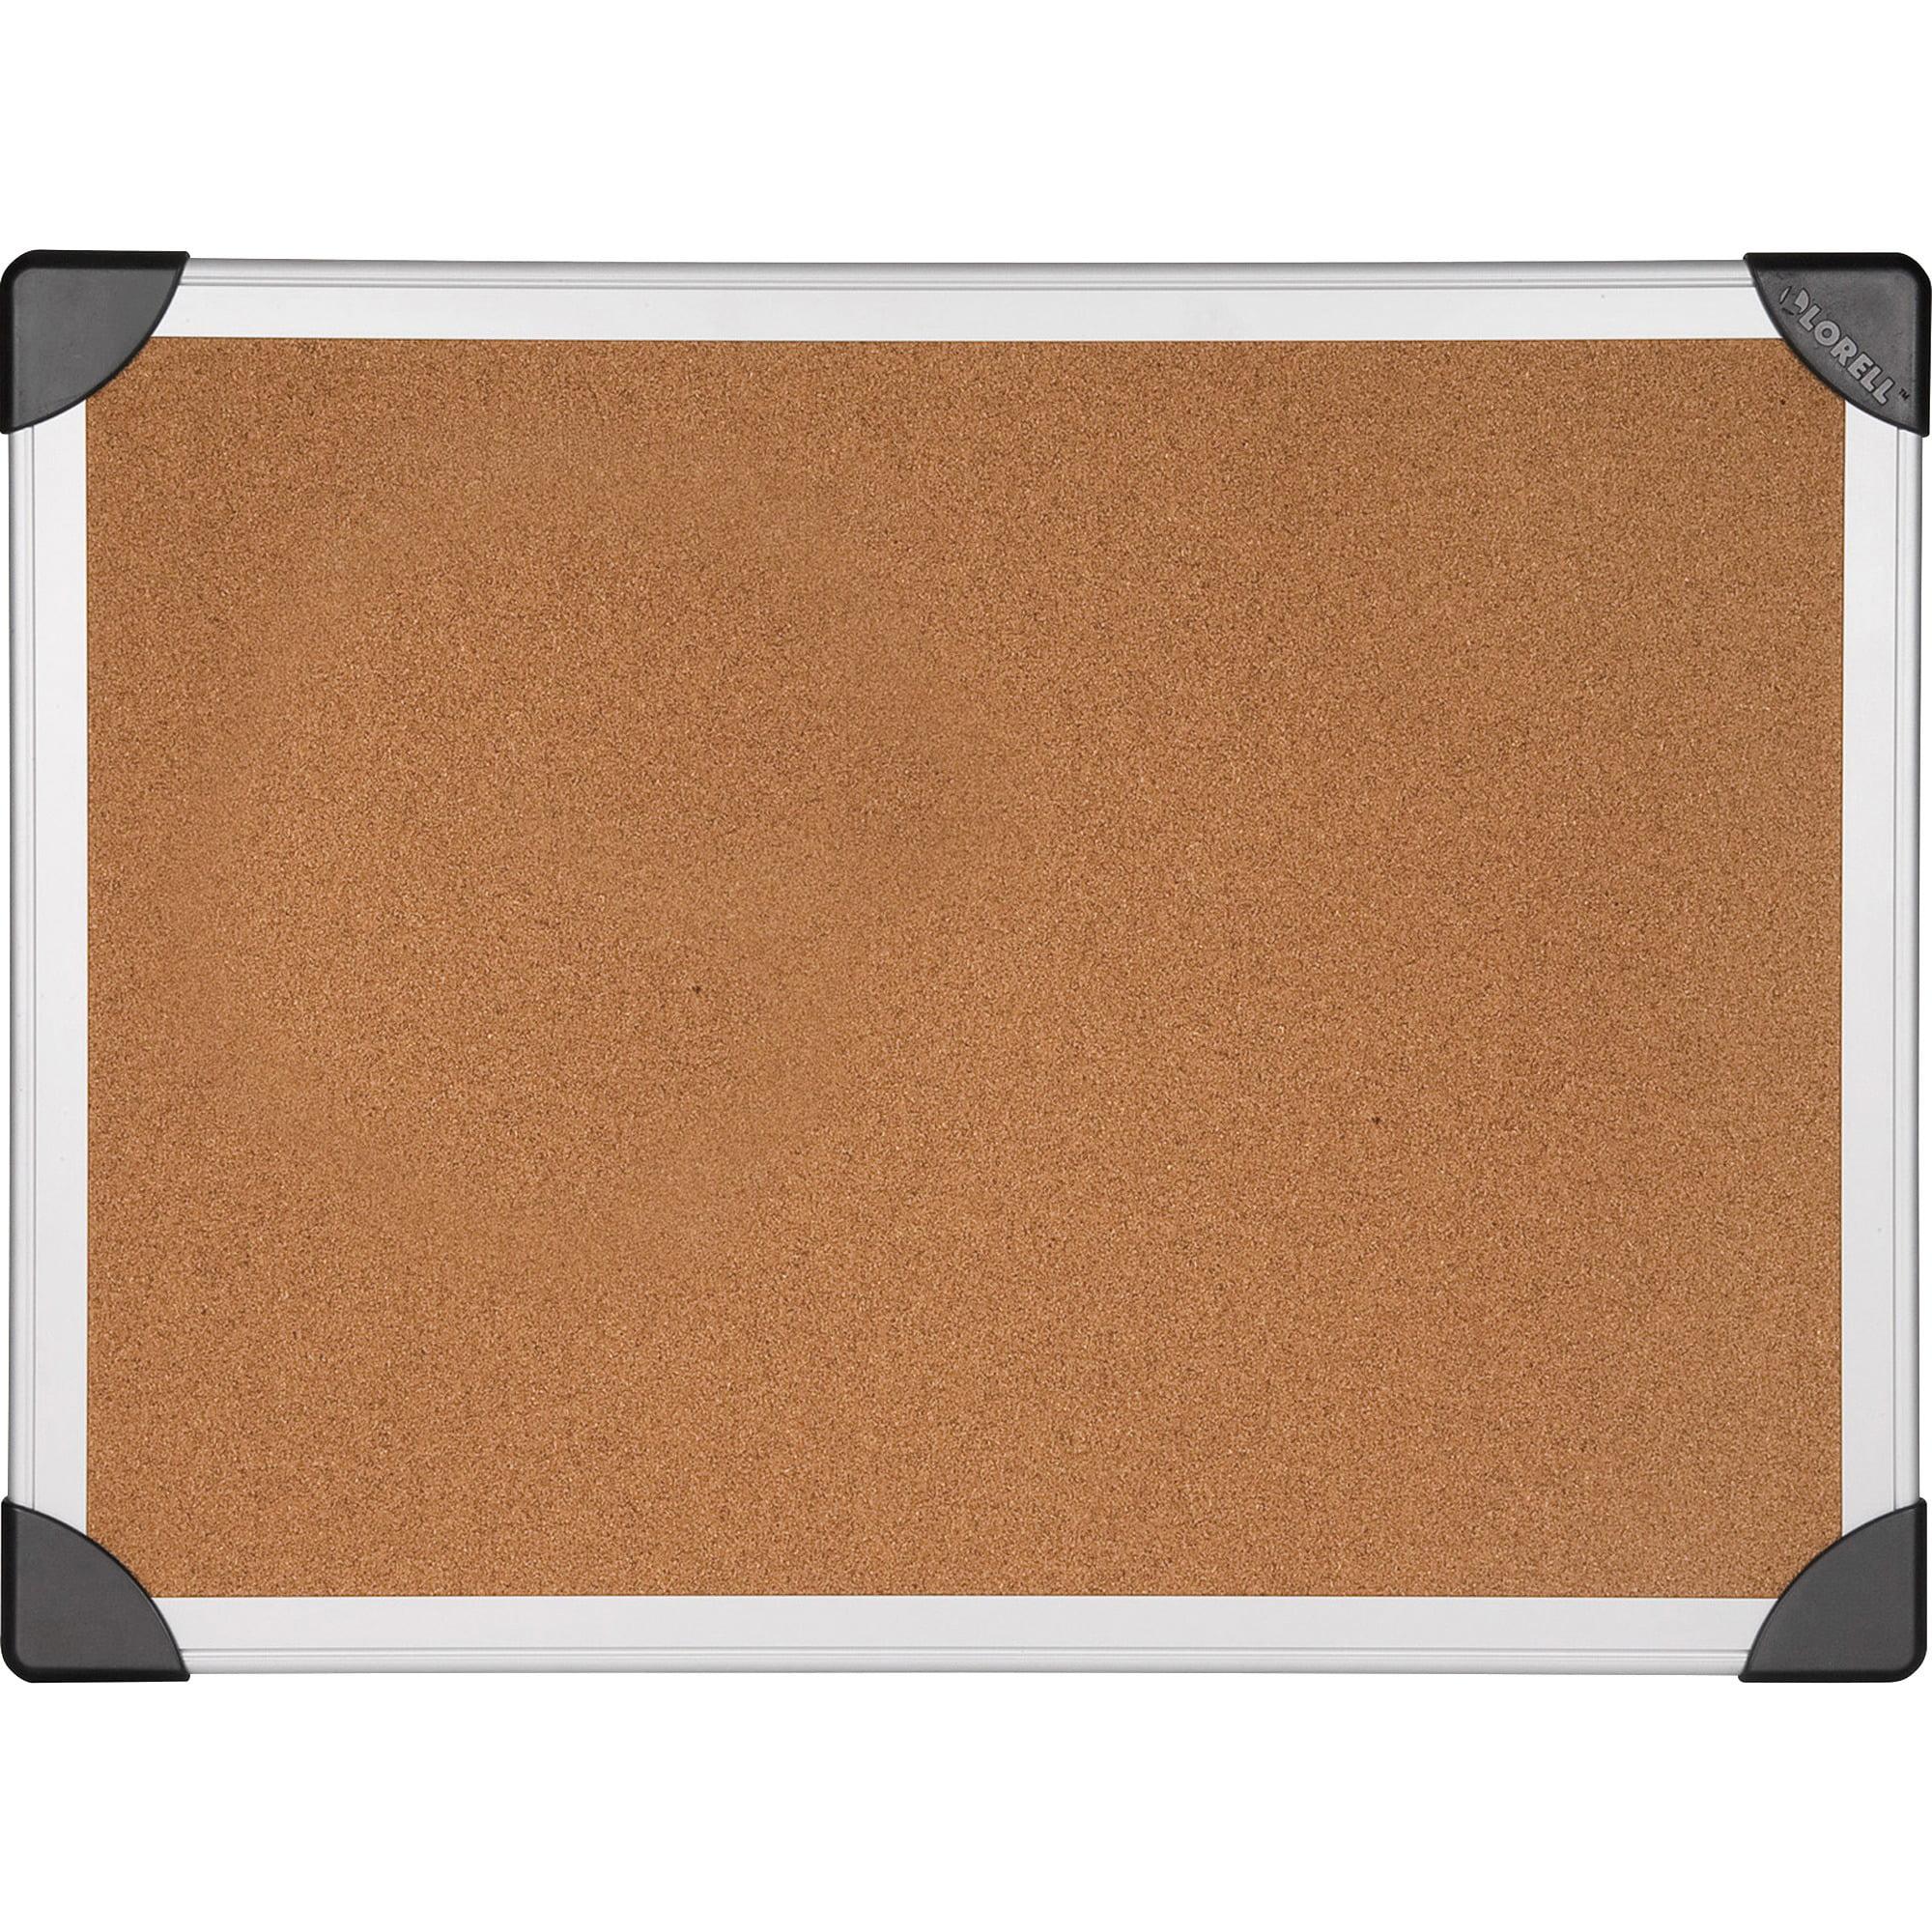 Lorell, LLR19194, Mounting Aluminum Frame Corkboards, 1 Each